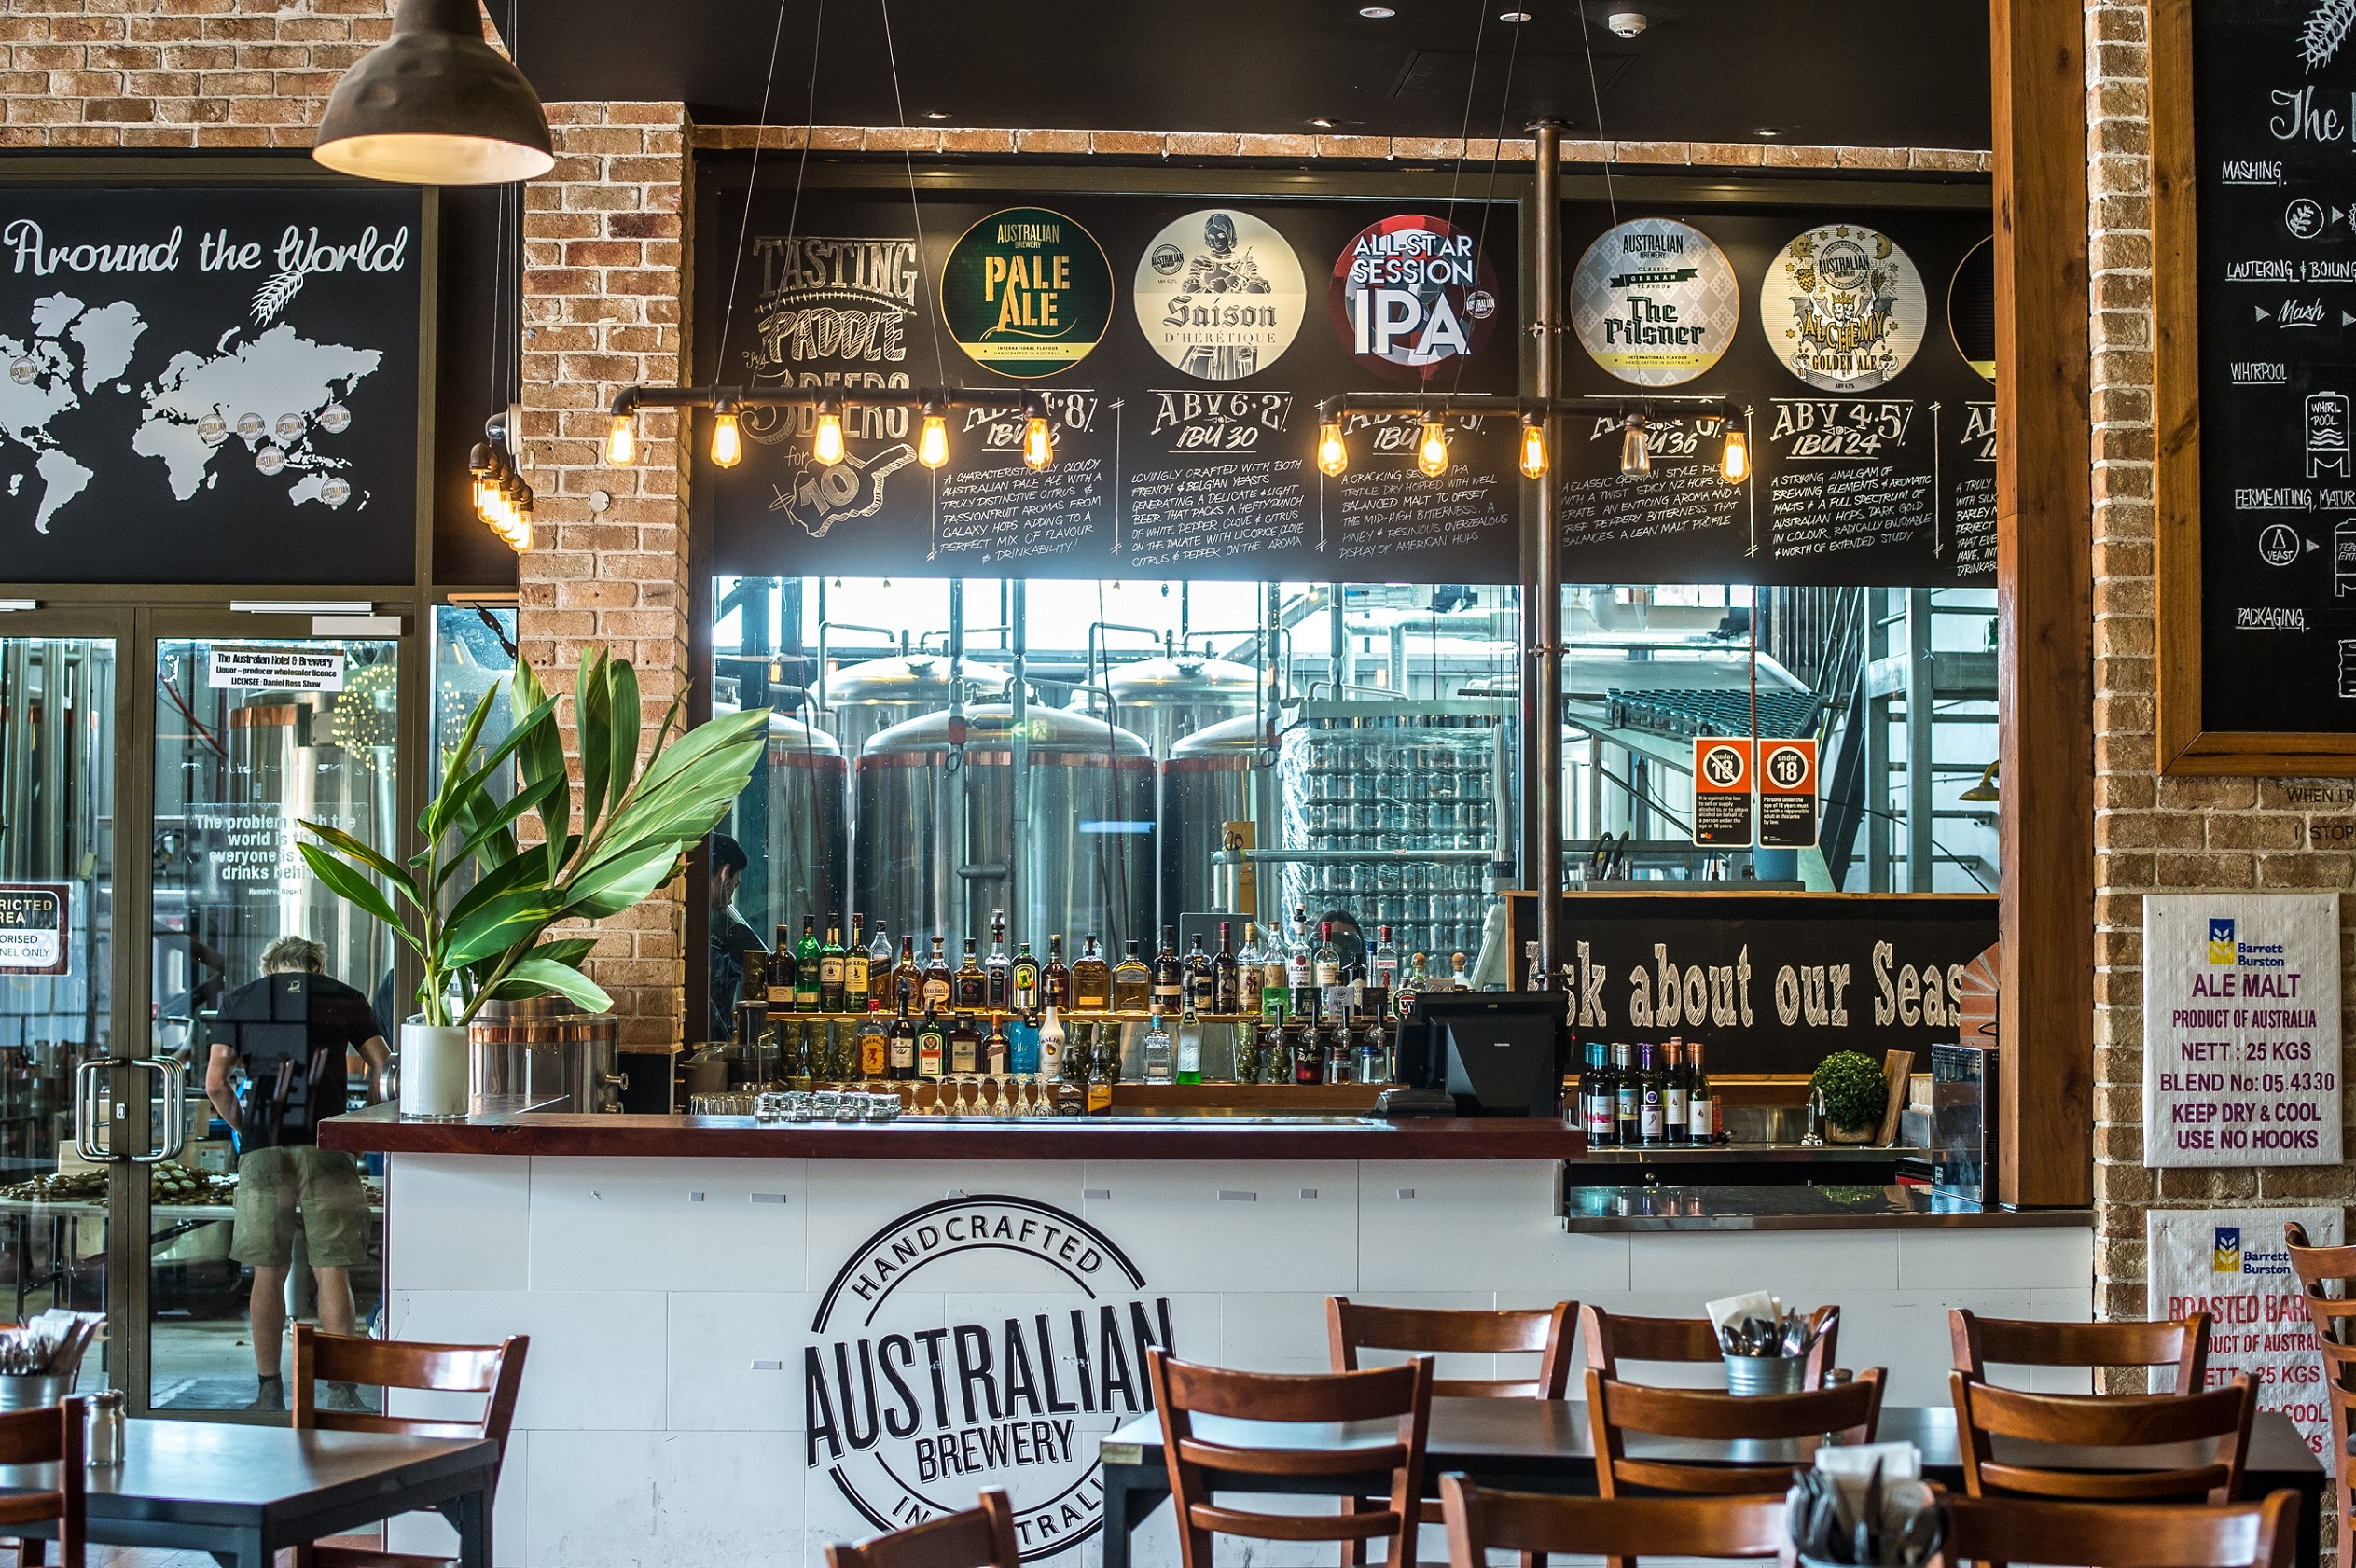 Australian Brewery Redcape